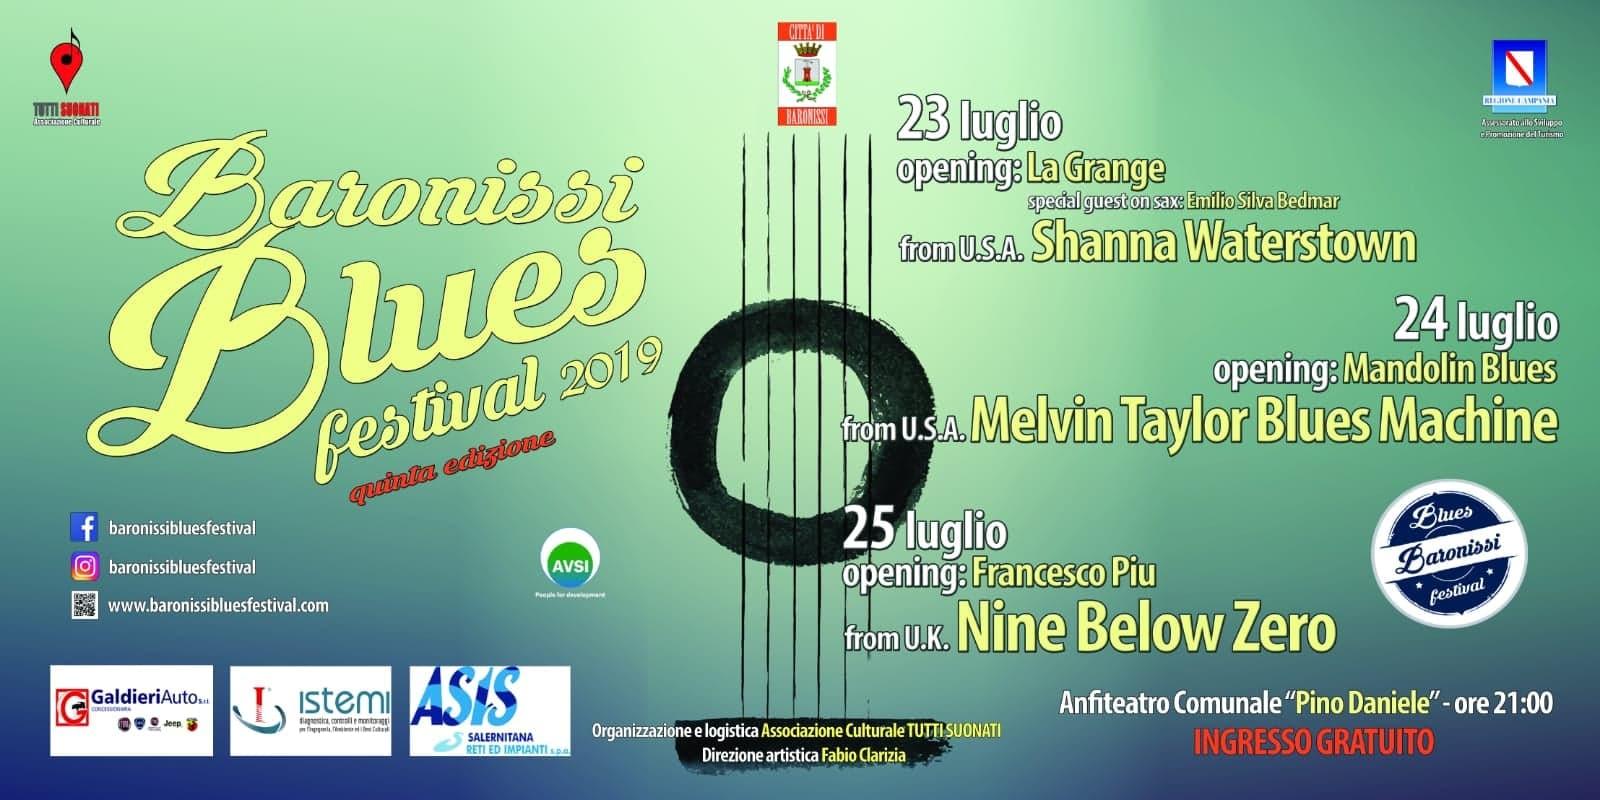 Baronissi Blues Festival 2019